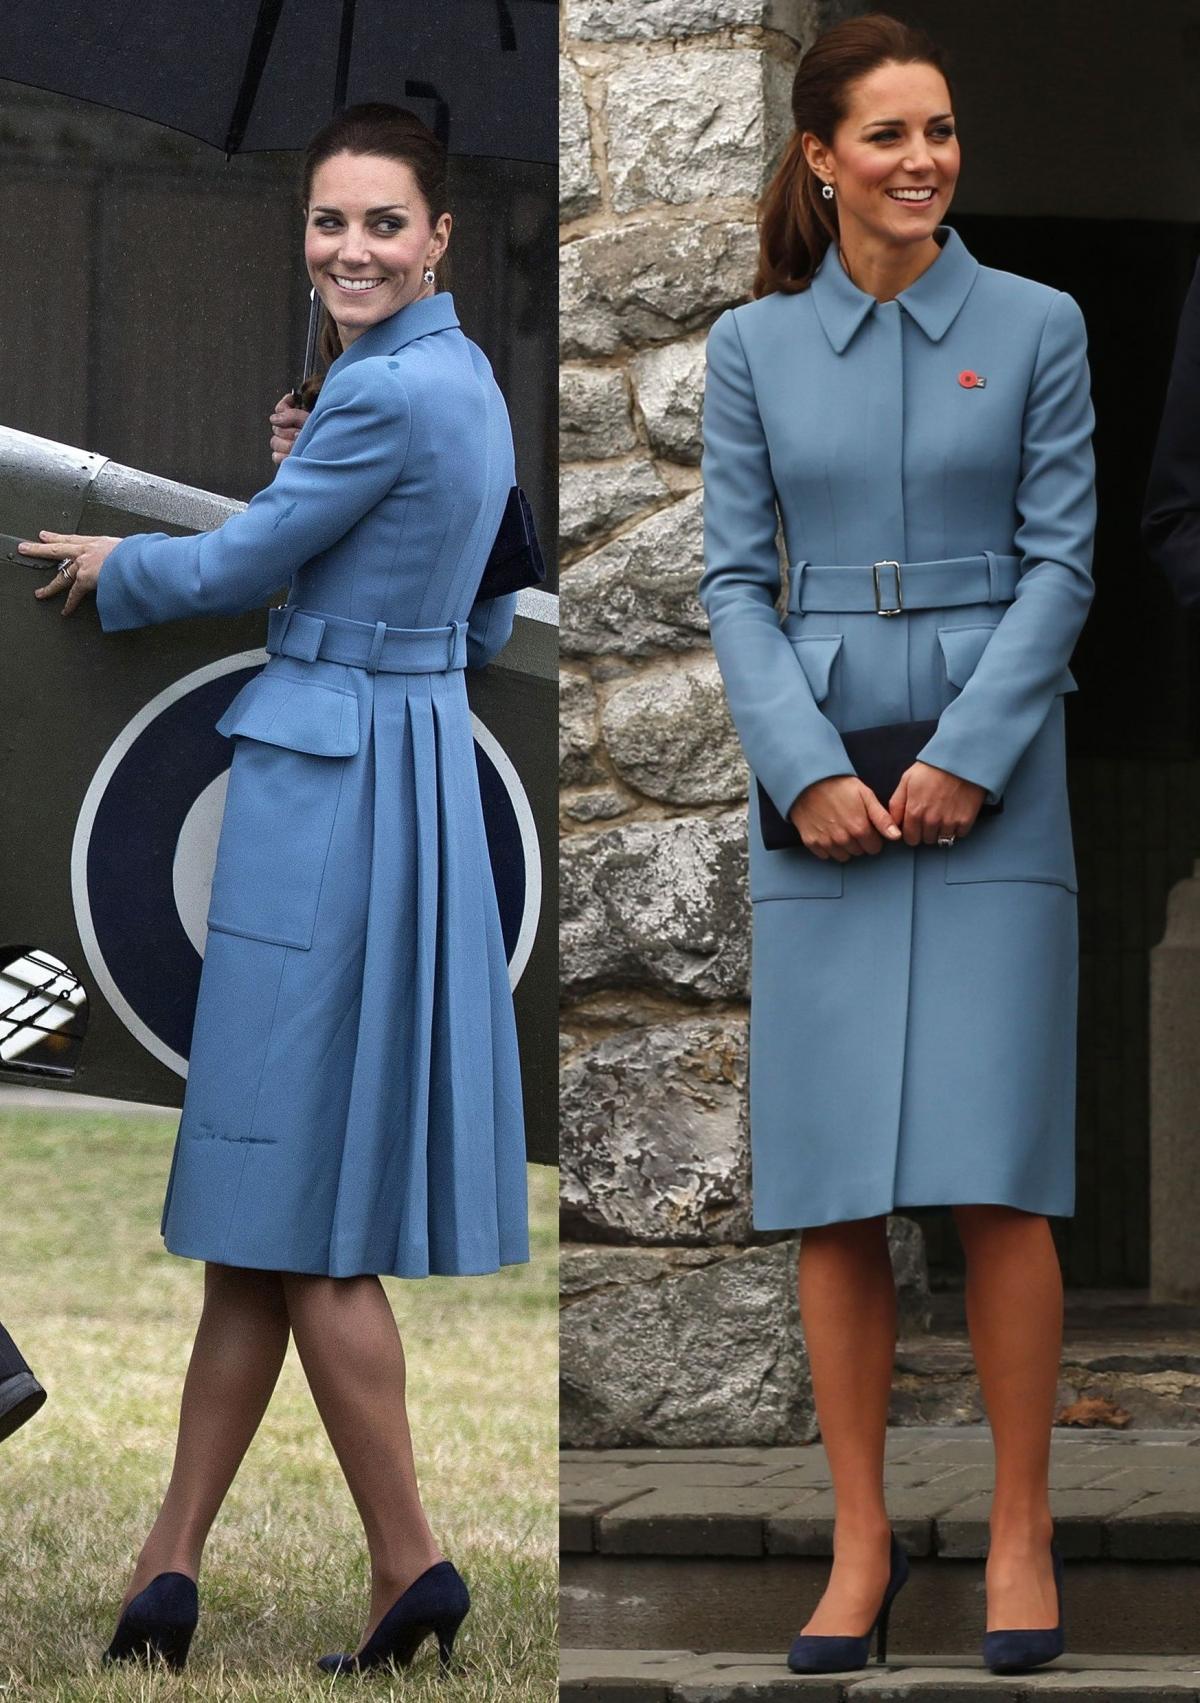 Wonderful Kate Middleton Mum Wedding Outfit Ideas - Wedding Ideas ...